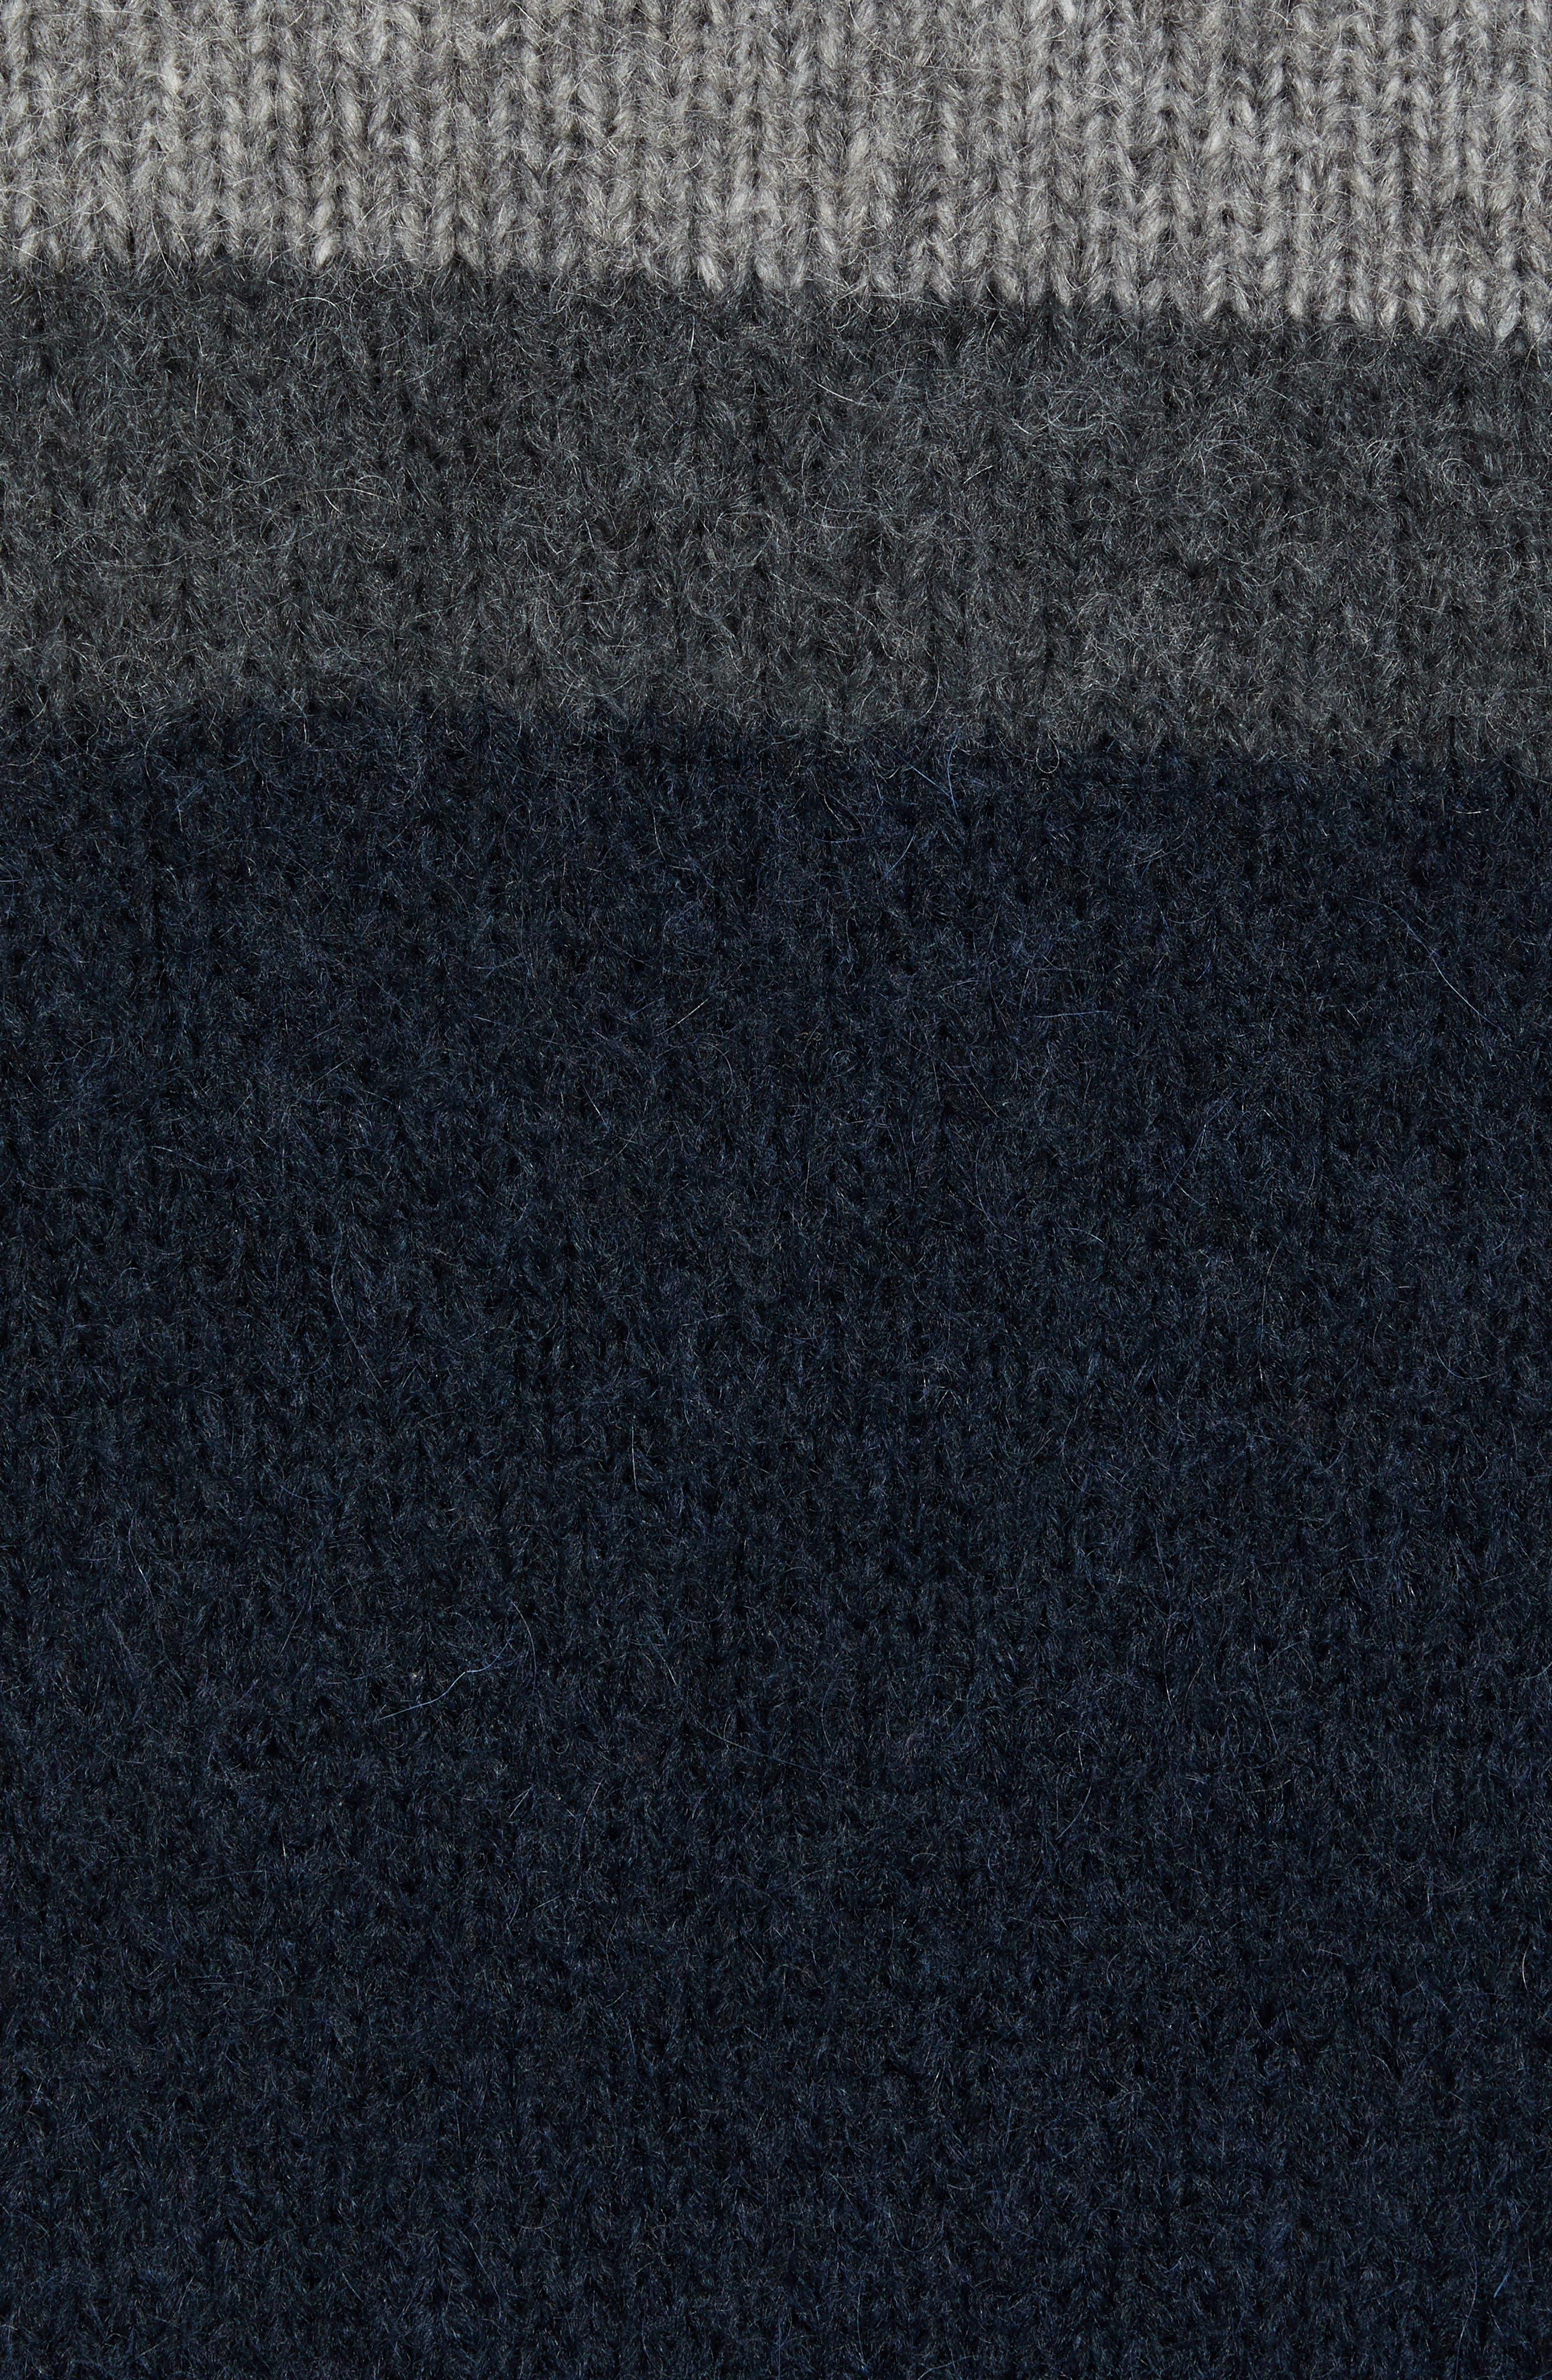 Stripe Sweater,                             Alternate thumbnail 5, color,                             UTILITY BLUE CHARCOAL MELANGE